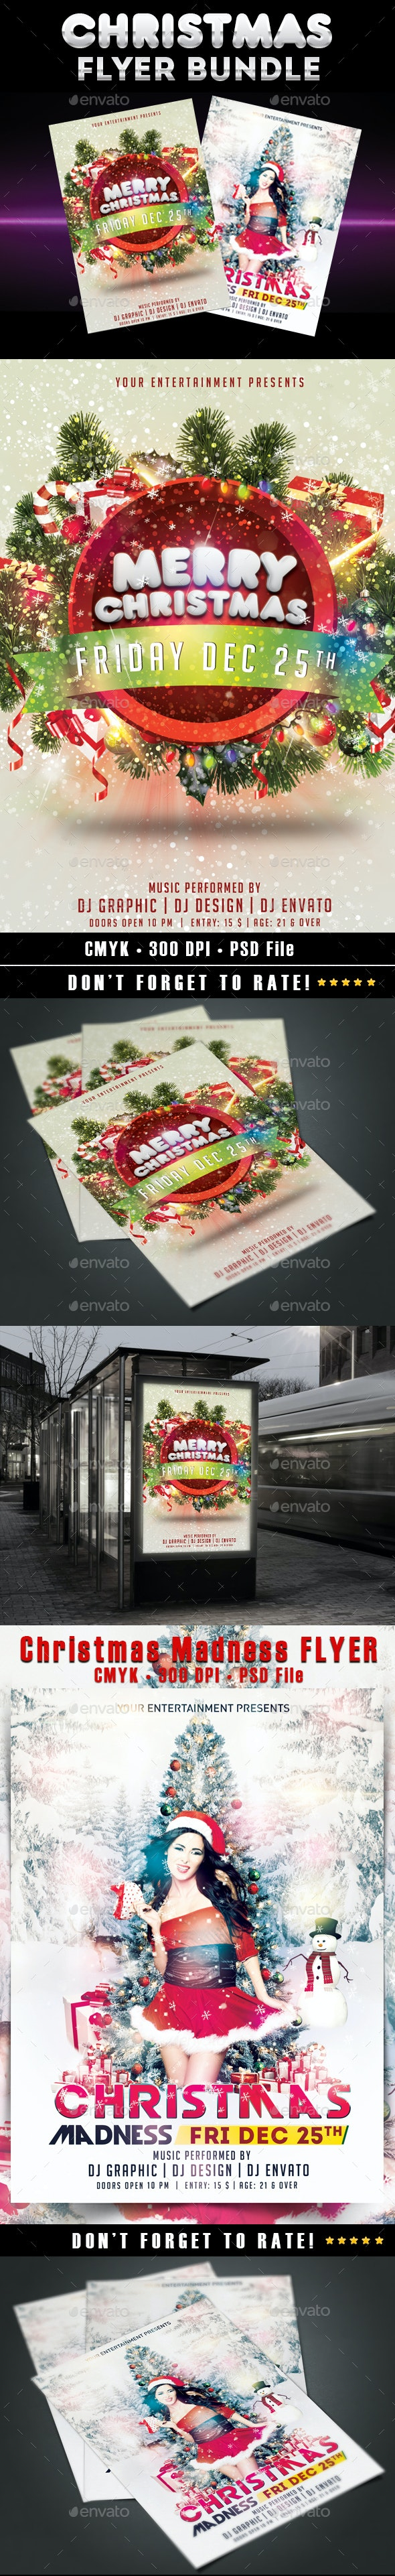 Christmas Flyer Bundle - Holidays Events